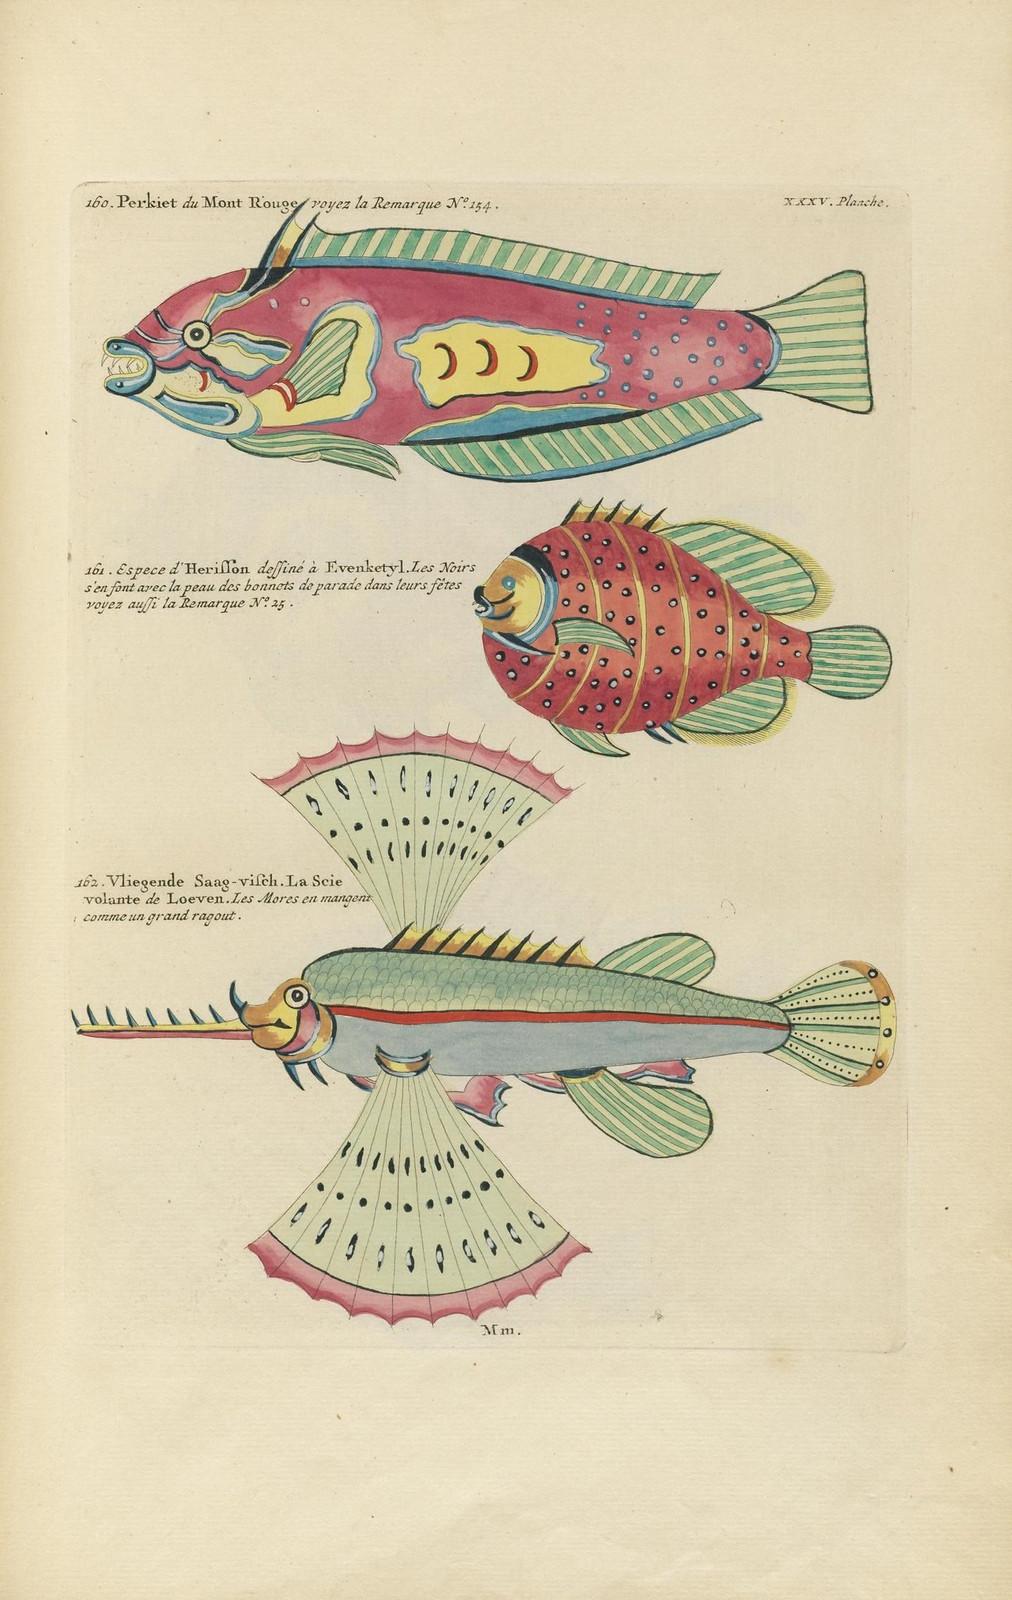 Louis Renard poissons 6